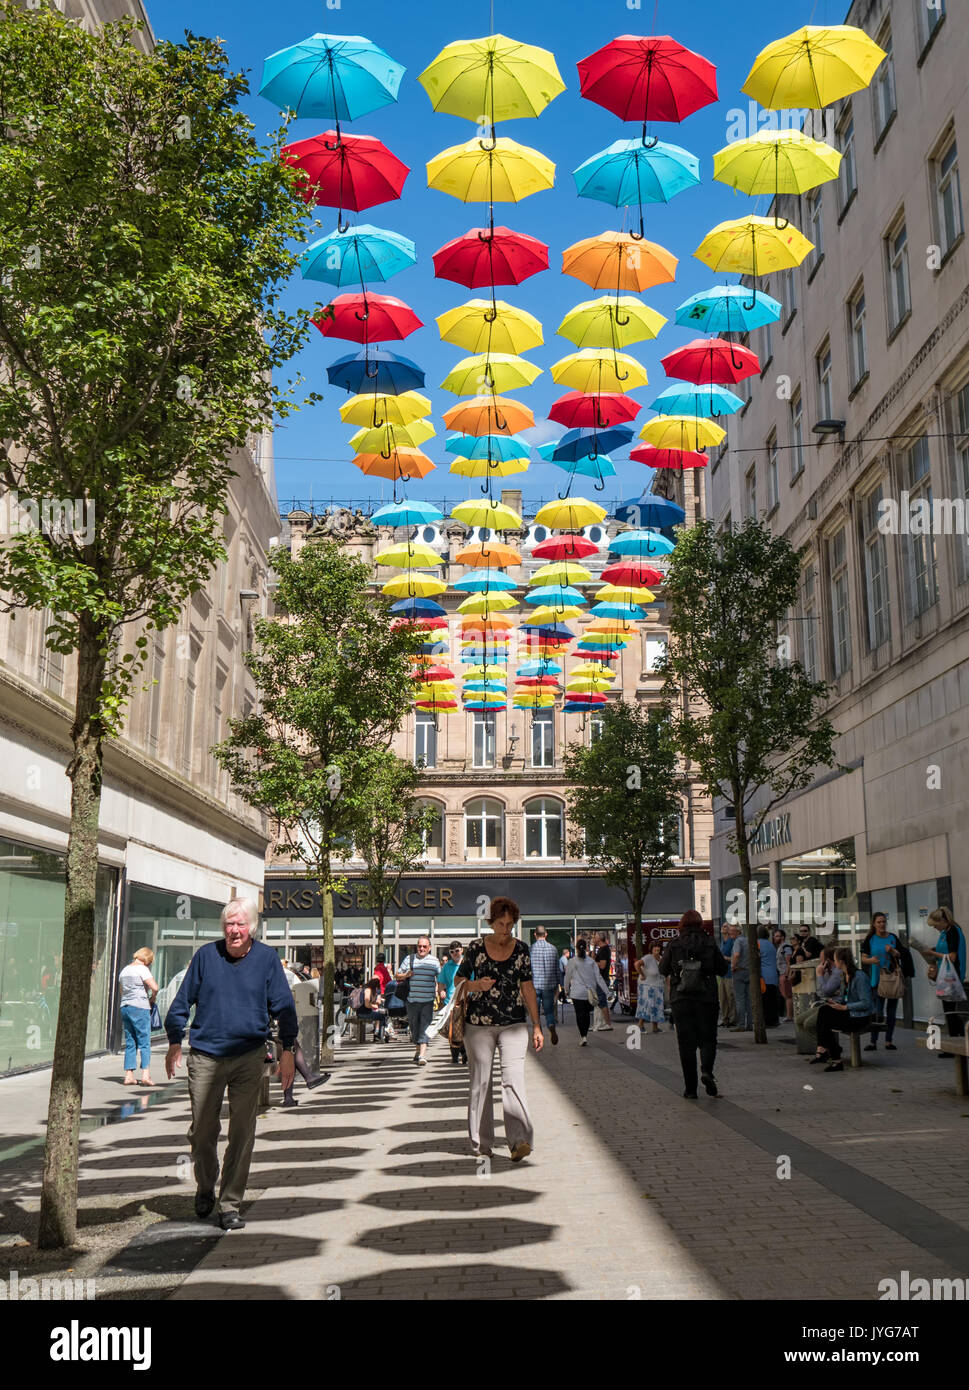 The Umbrella Project - sculpture in Liverpool Stock Photo